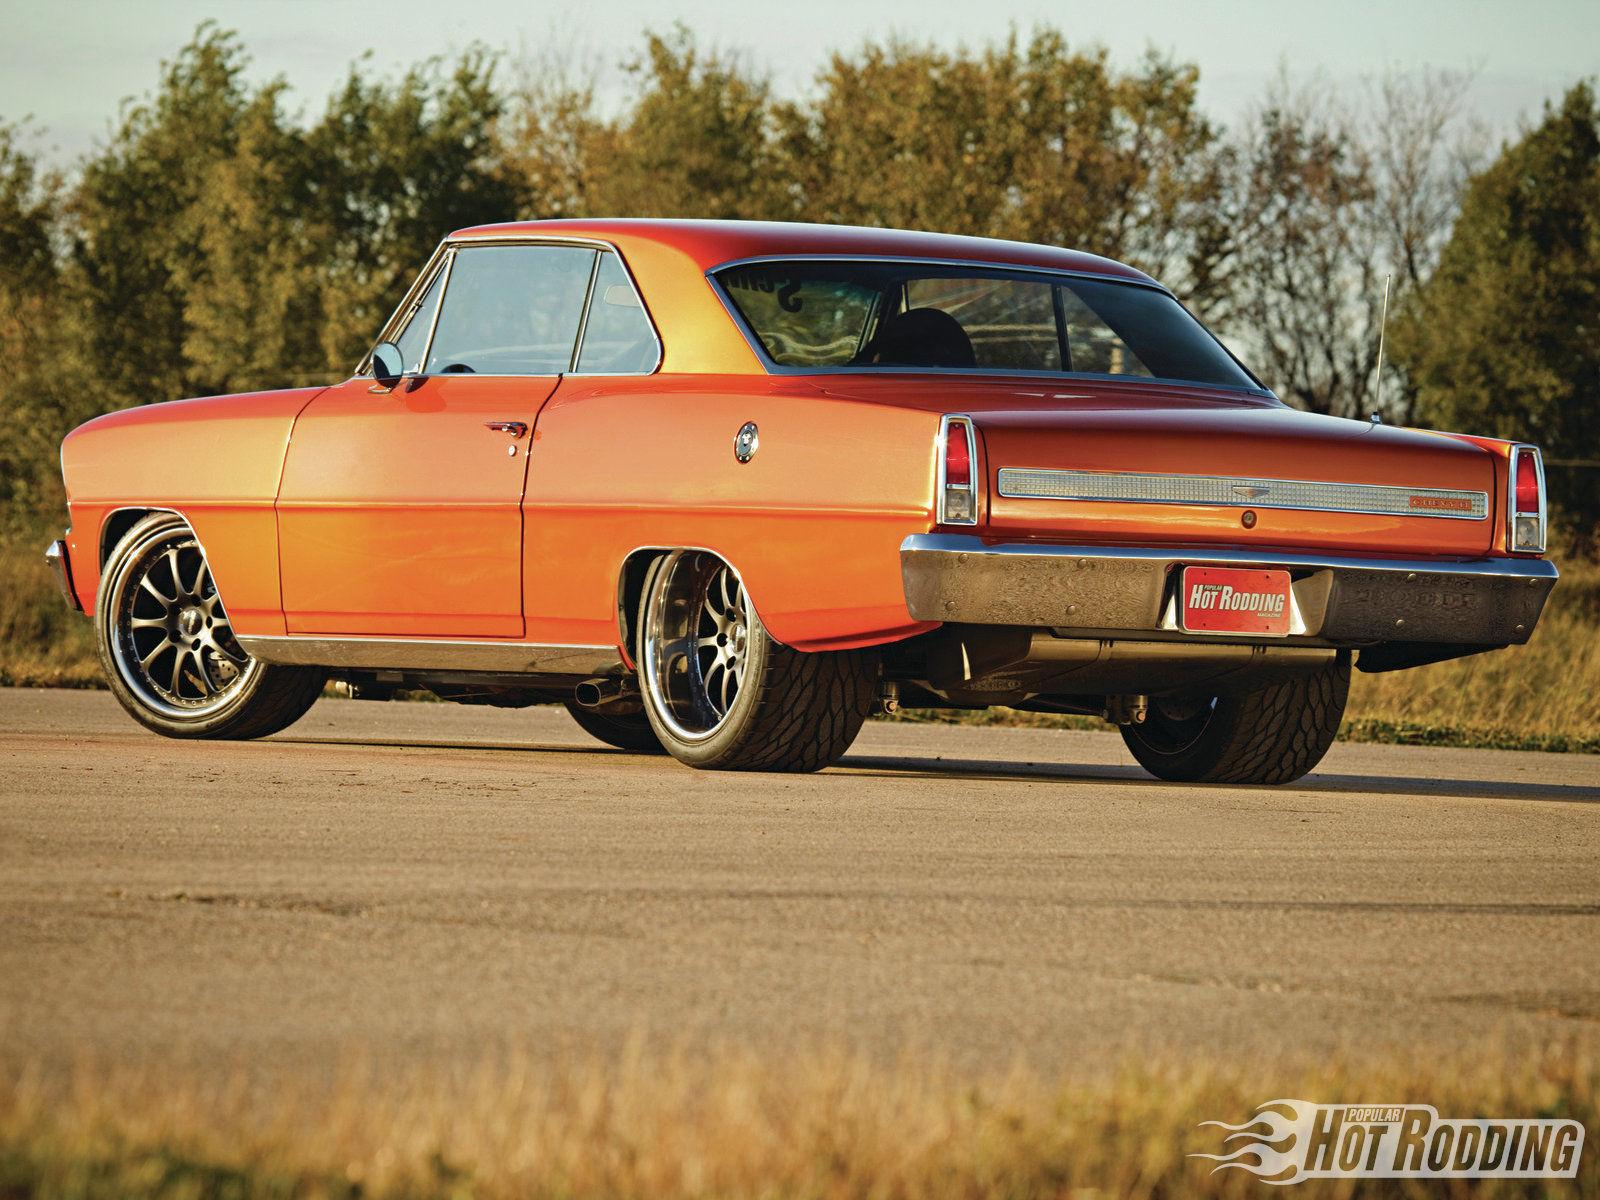 1967 Chevrolet Nova | Schwartz Performance '67 Chevy Nova on Forgeline ZX3P Wheels